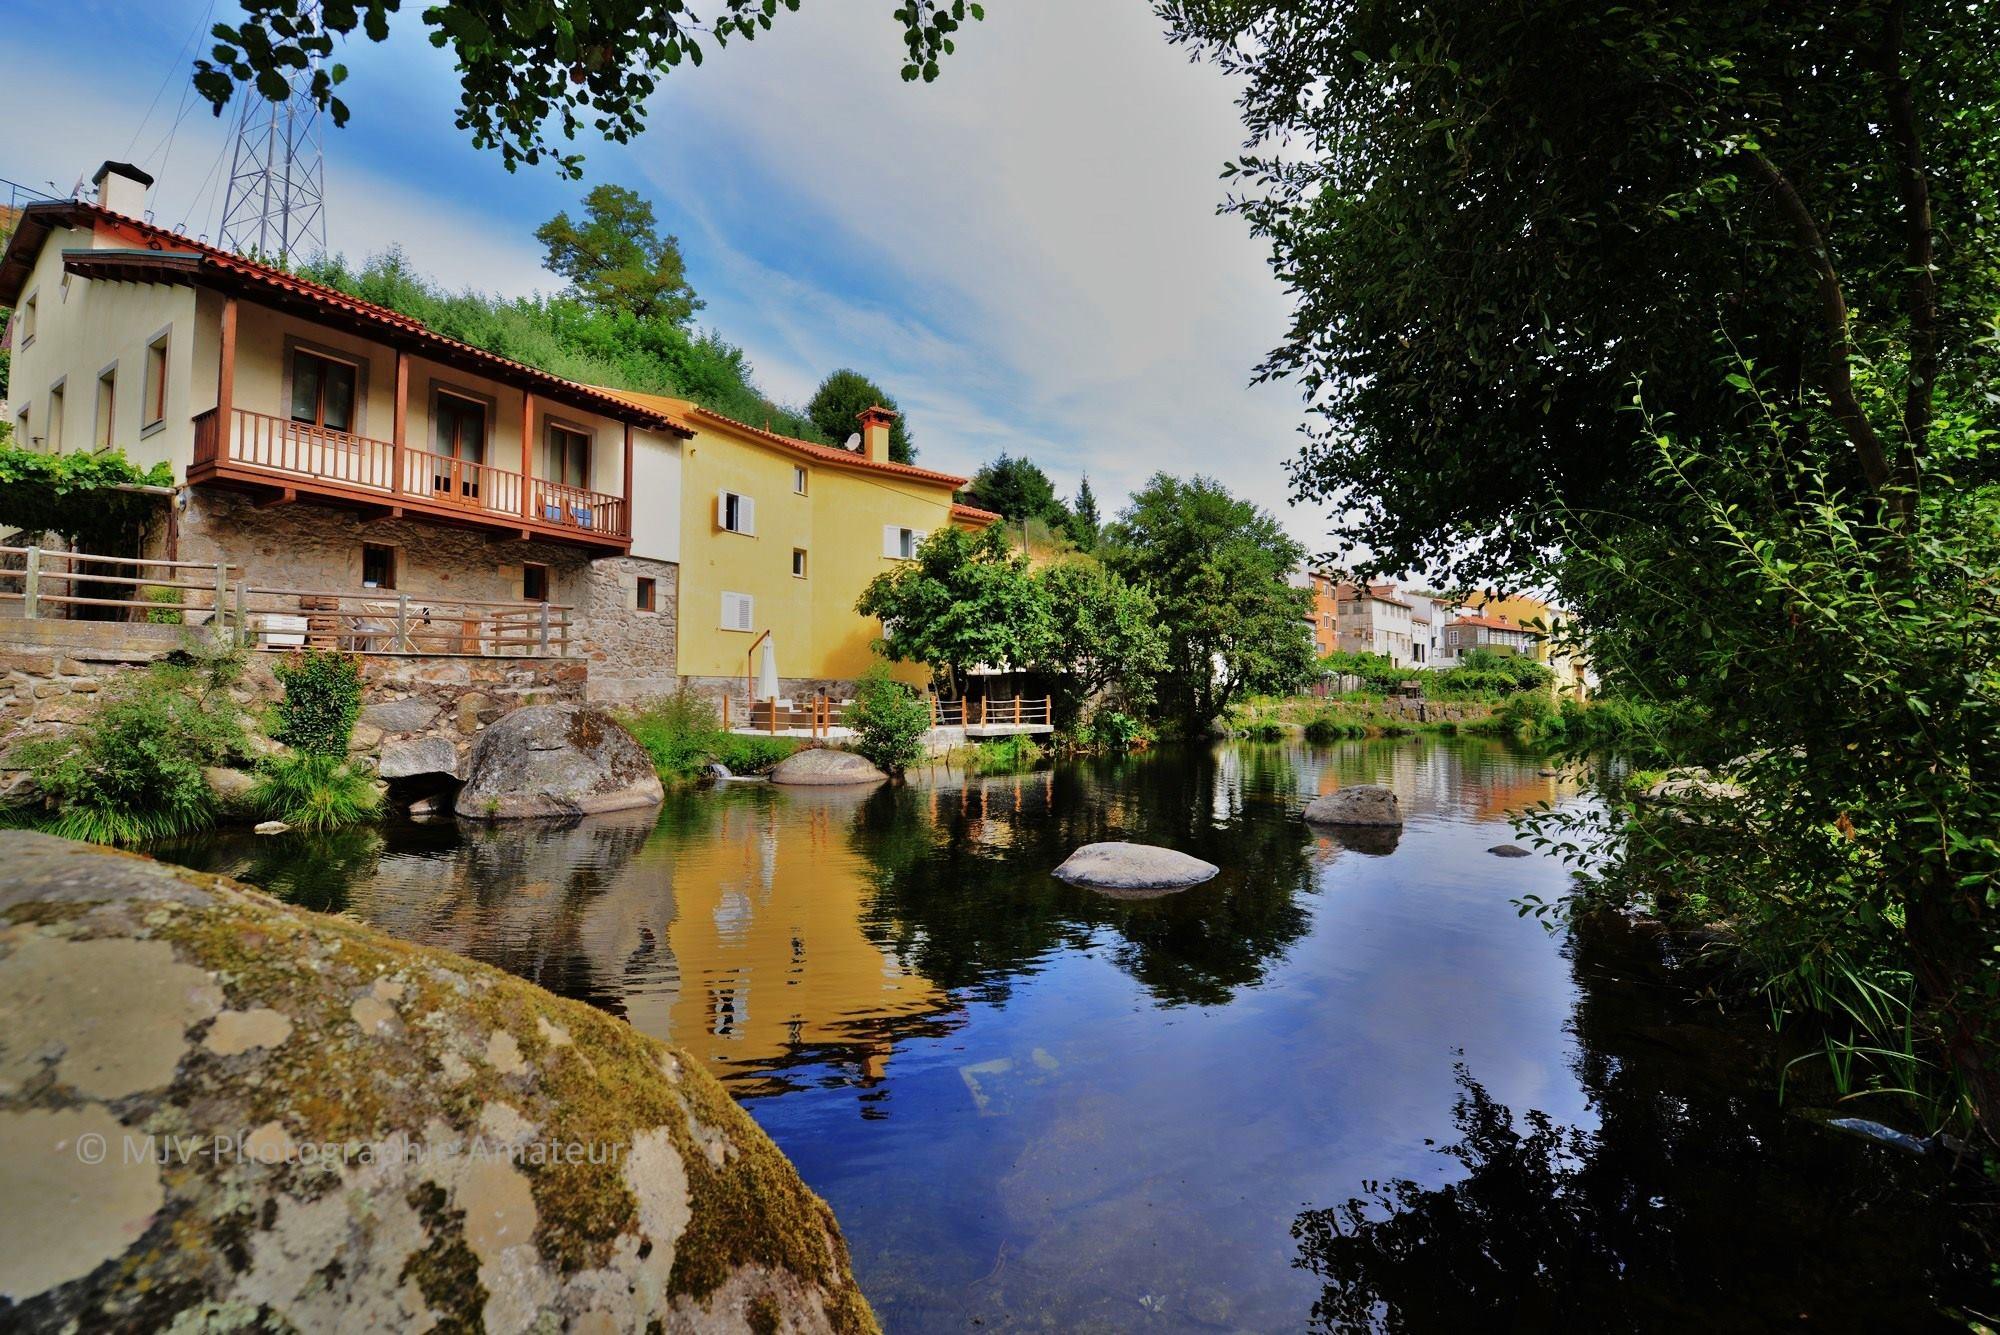 Lamego: Bairro da Ponte interdita a banhos devido a Salmonella